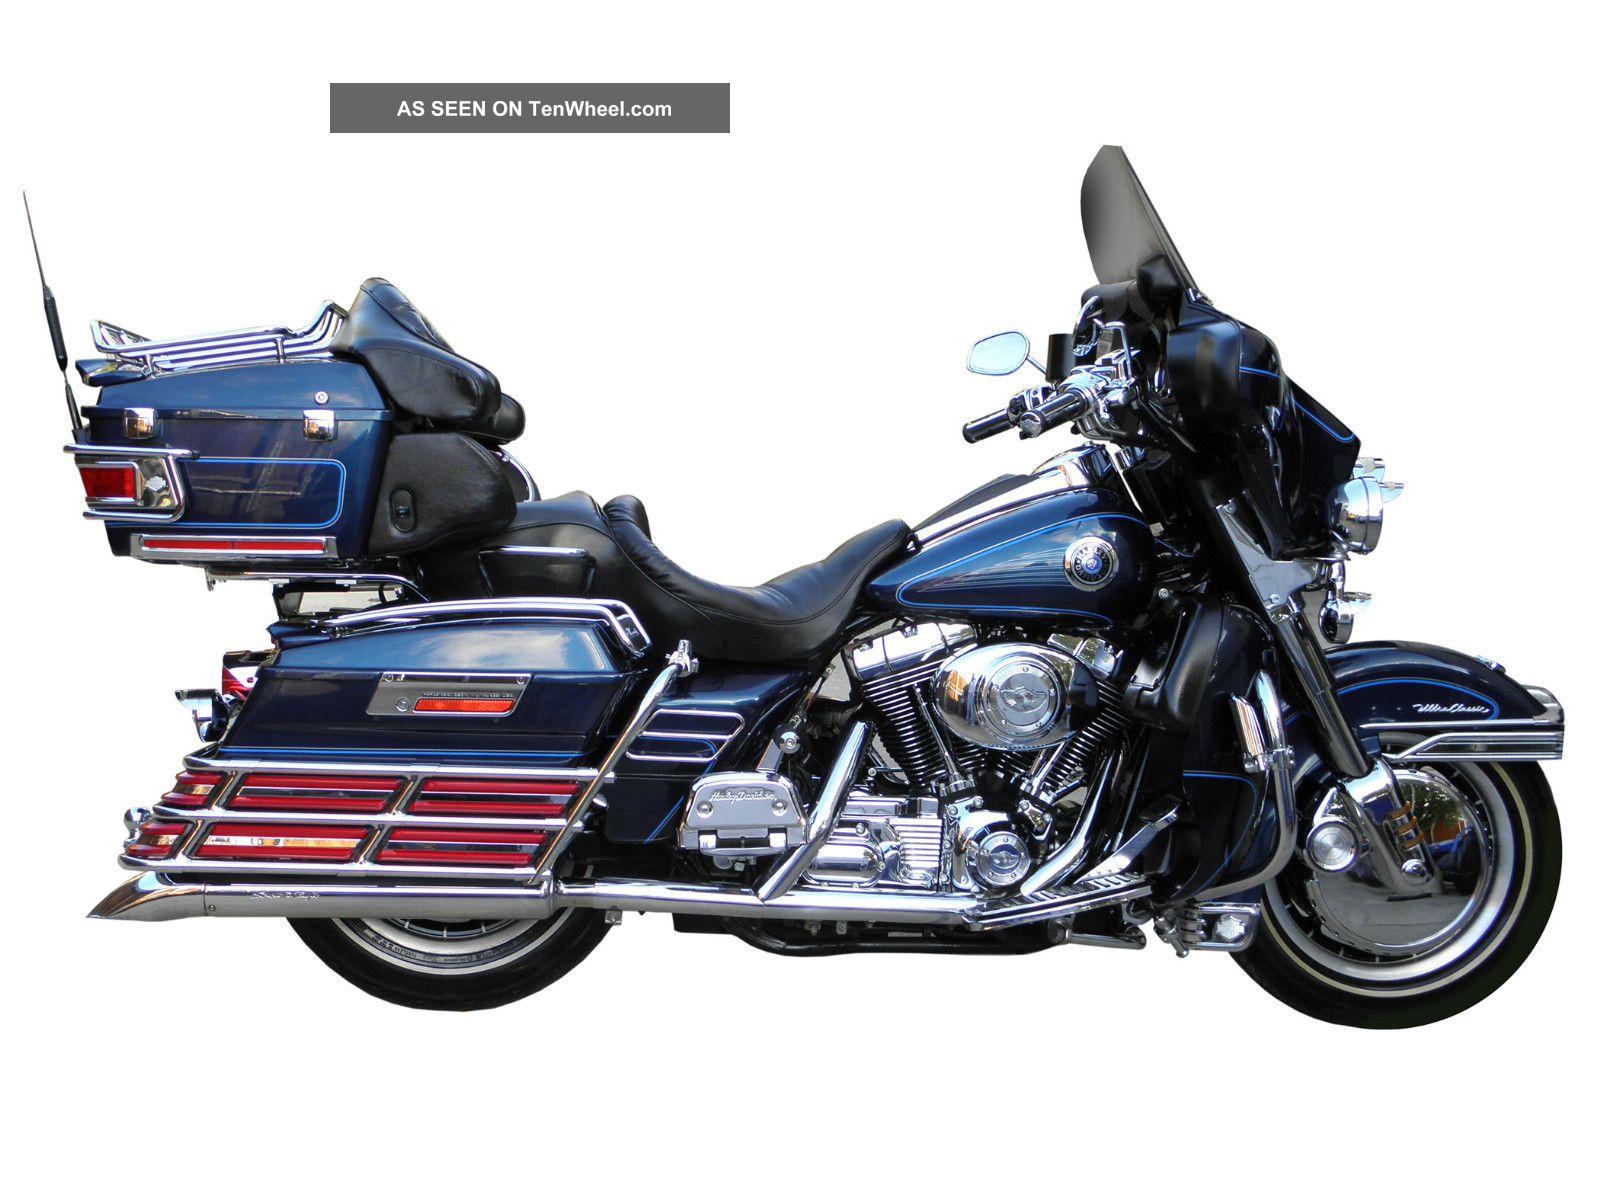 Harley Davidson Th Anniversary Ultra Classic Specs